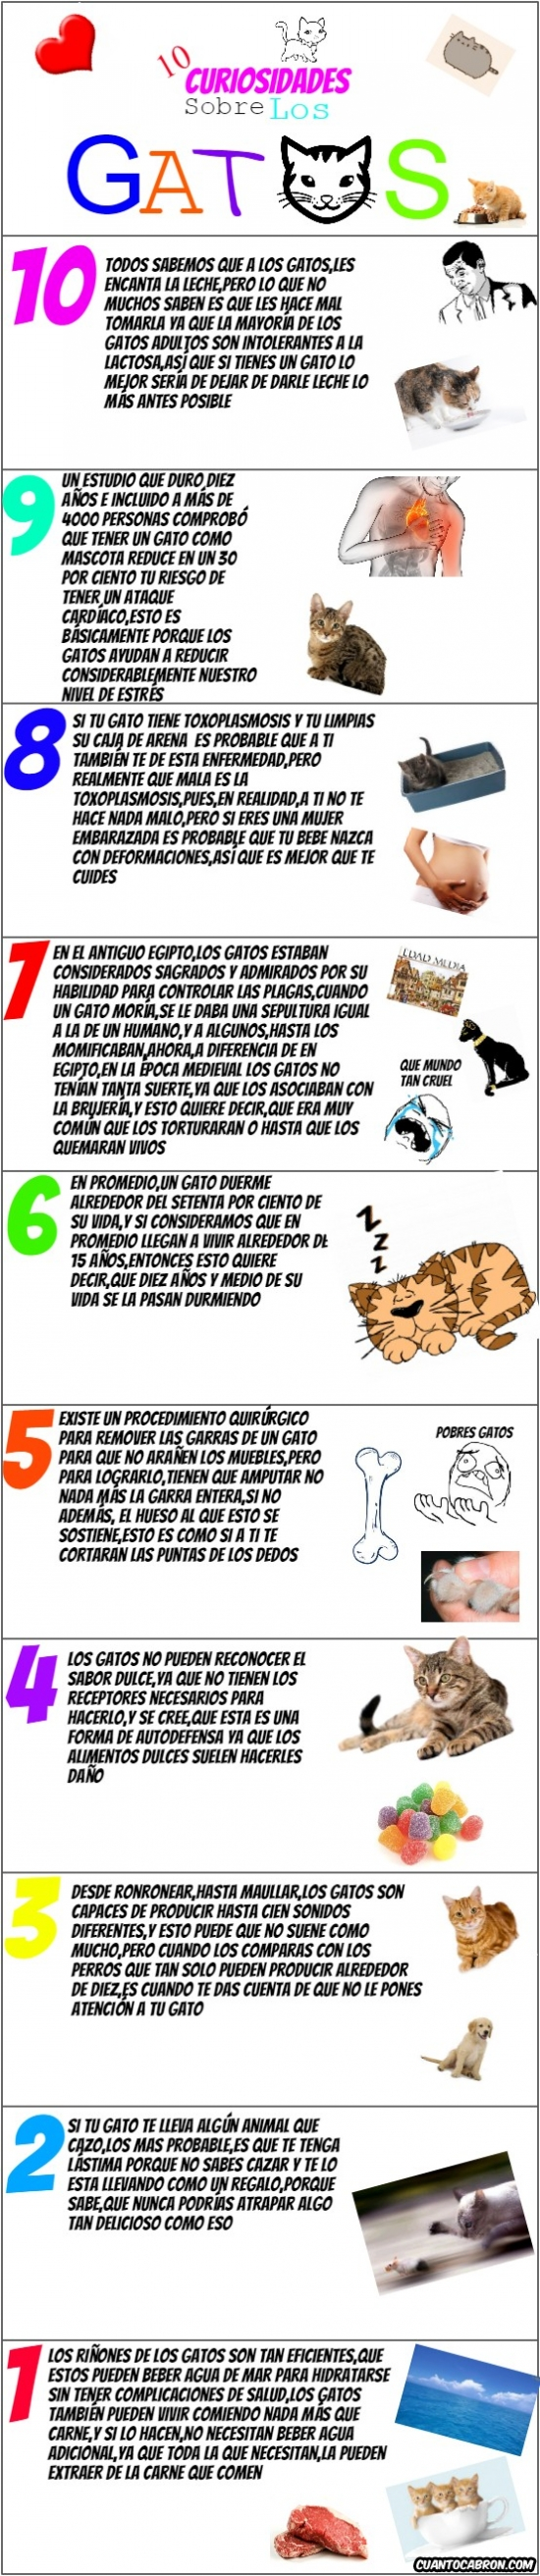 Mix - 10 curiosidades sobre los gatos